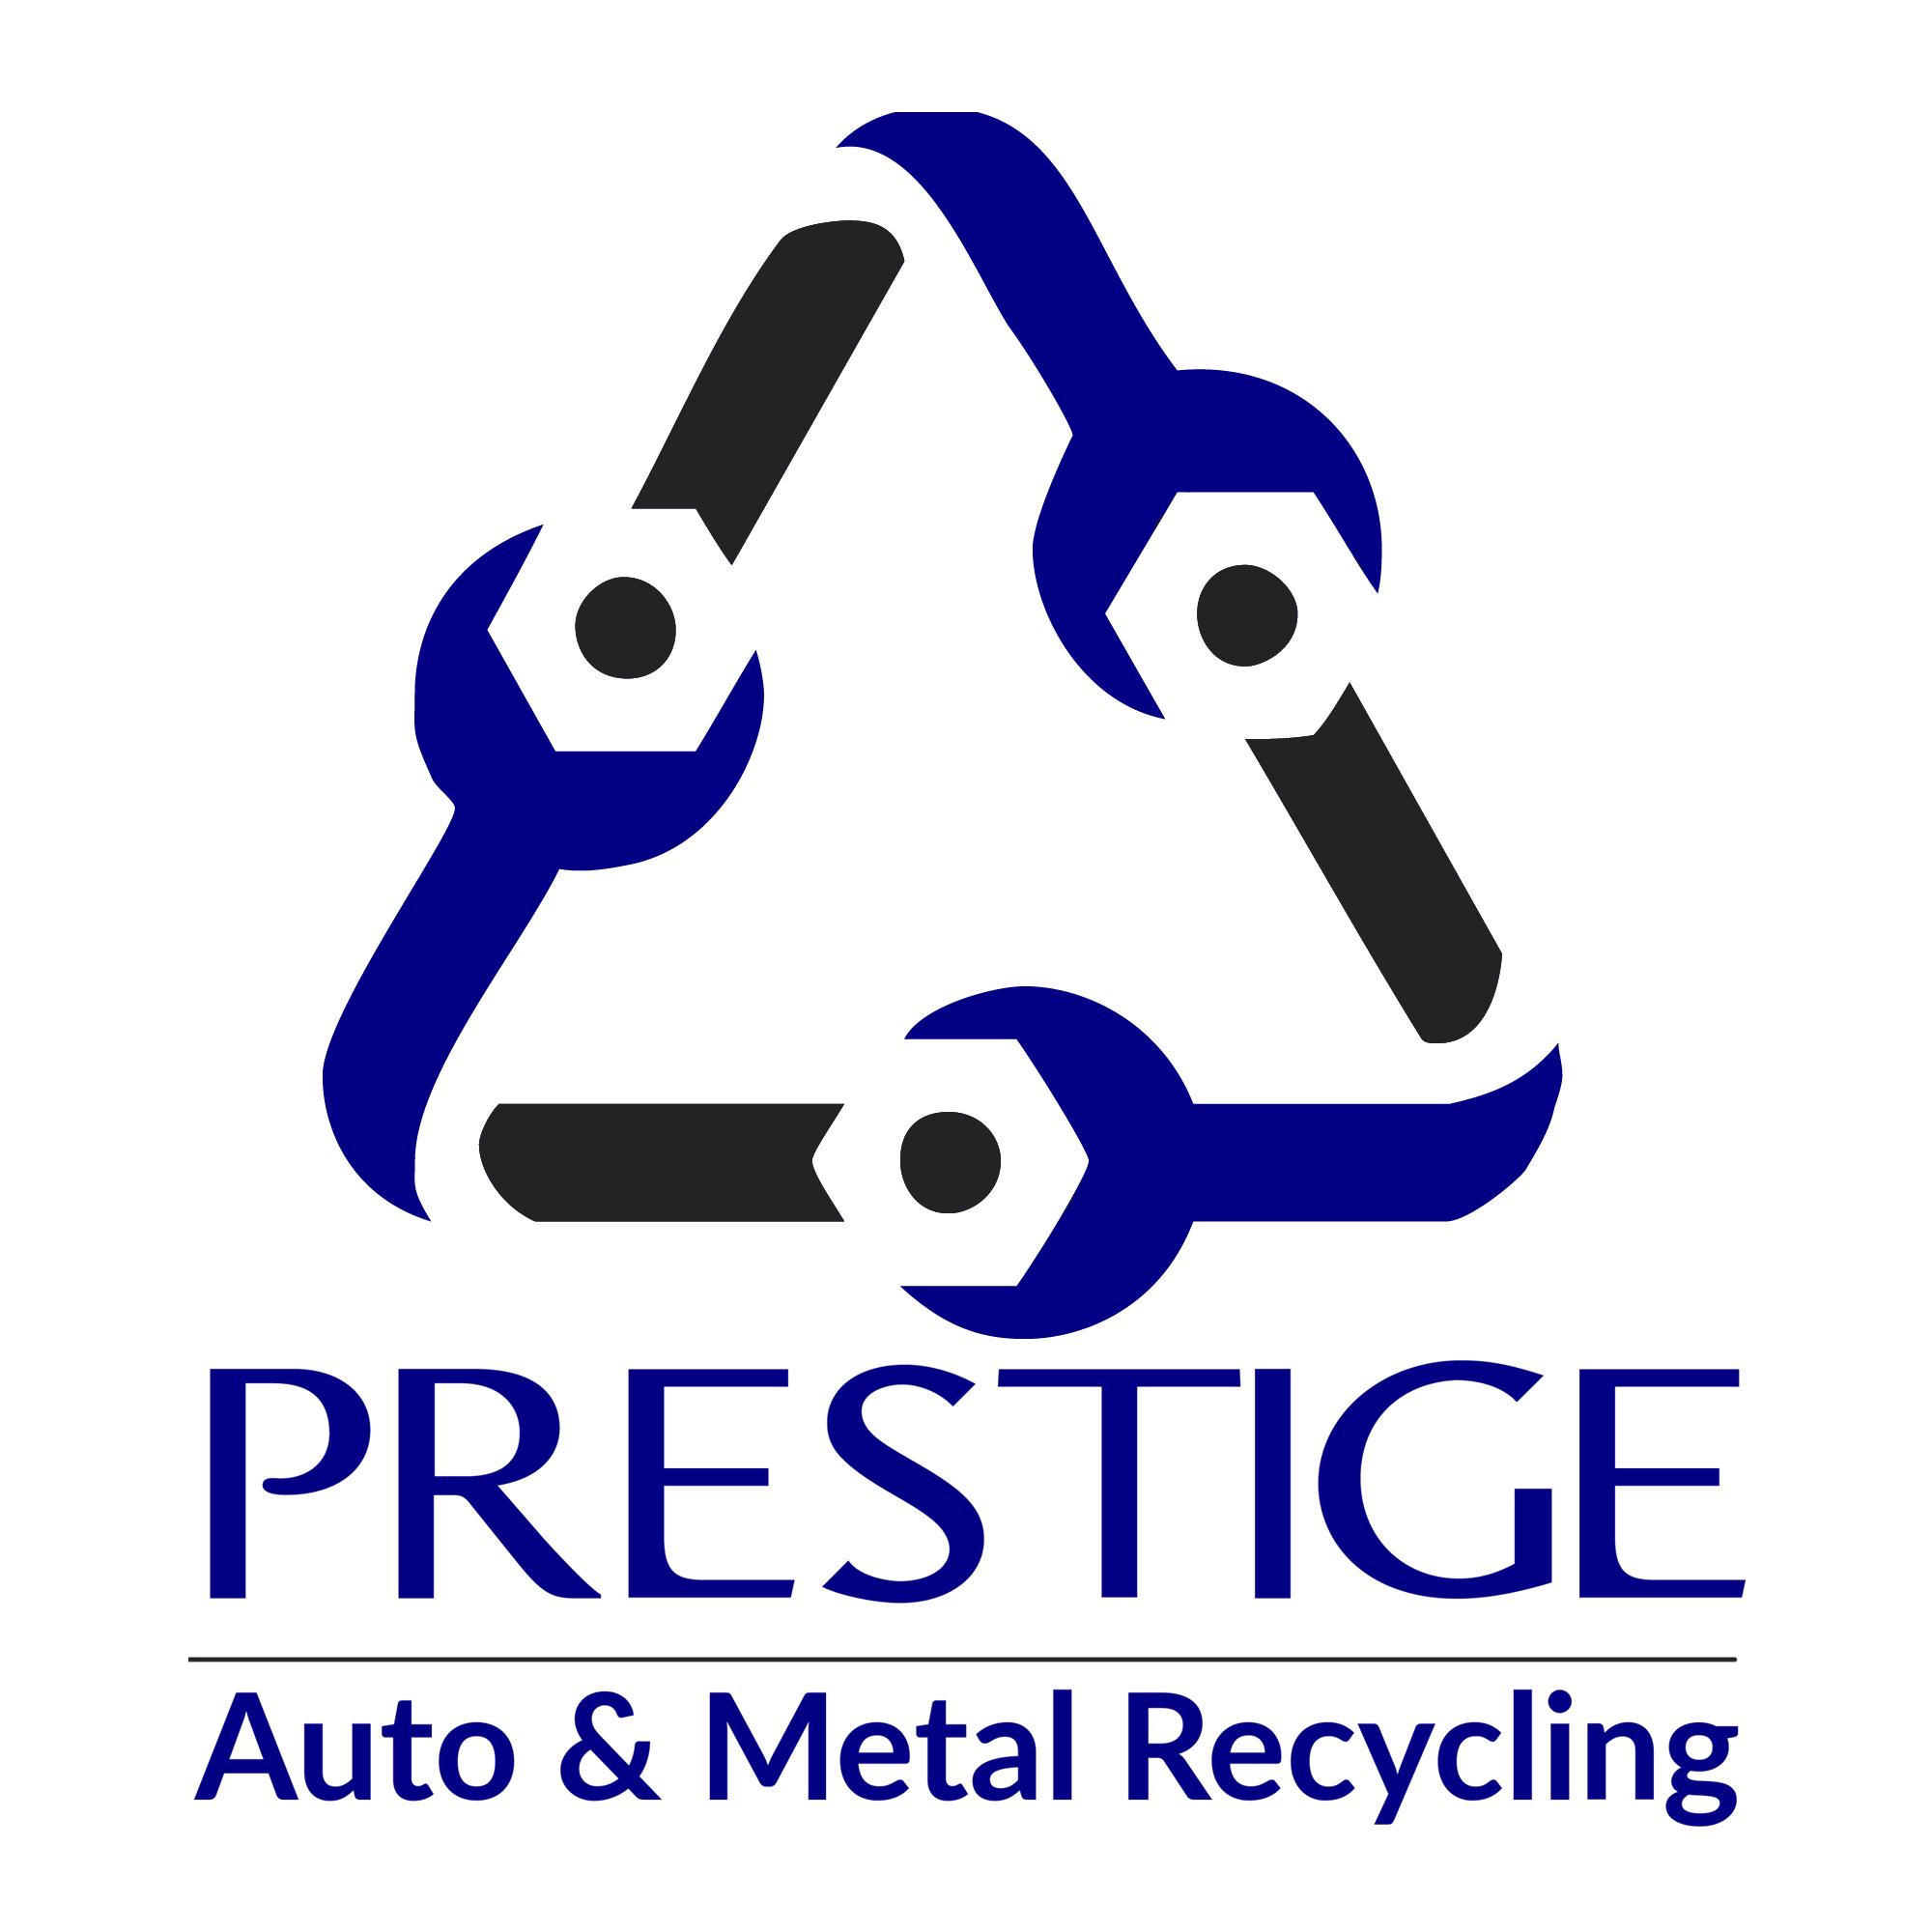 Prestige Auto & Metal Recycling